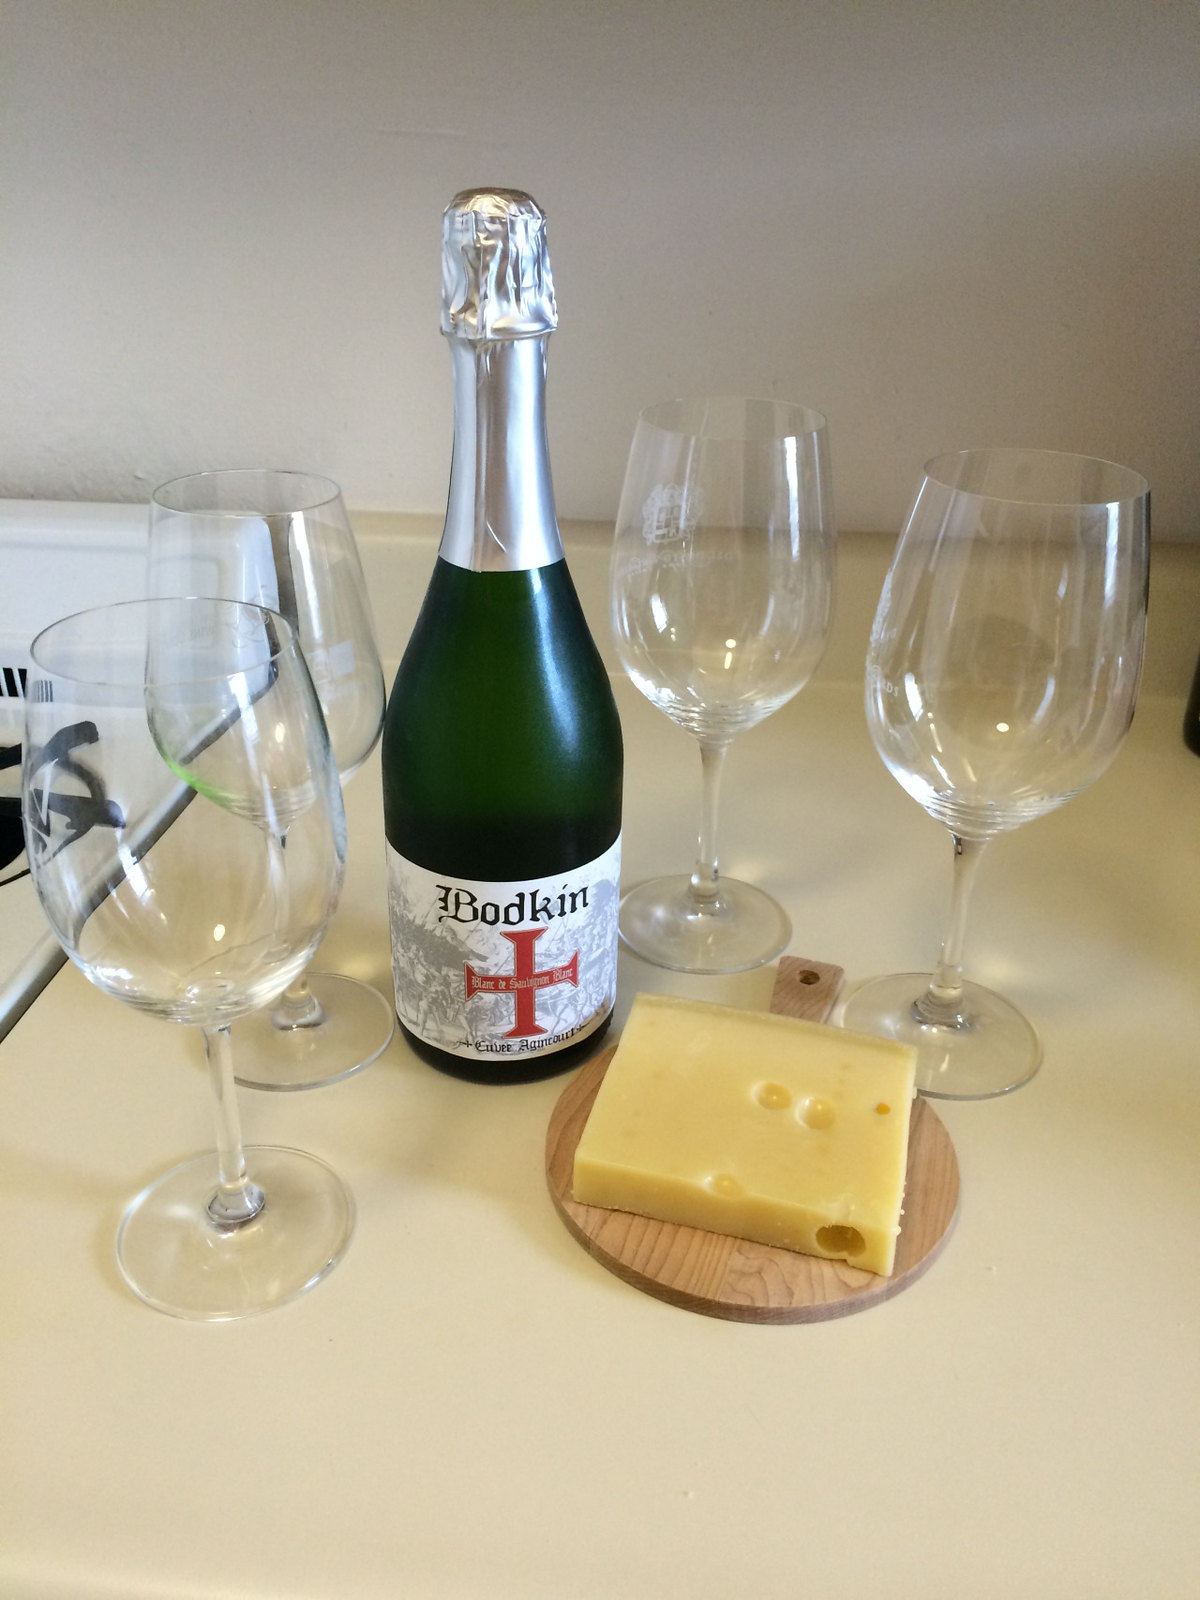 Bodkin Blanc de Sauvignon Blanc and Emmentaler Cheese 1